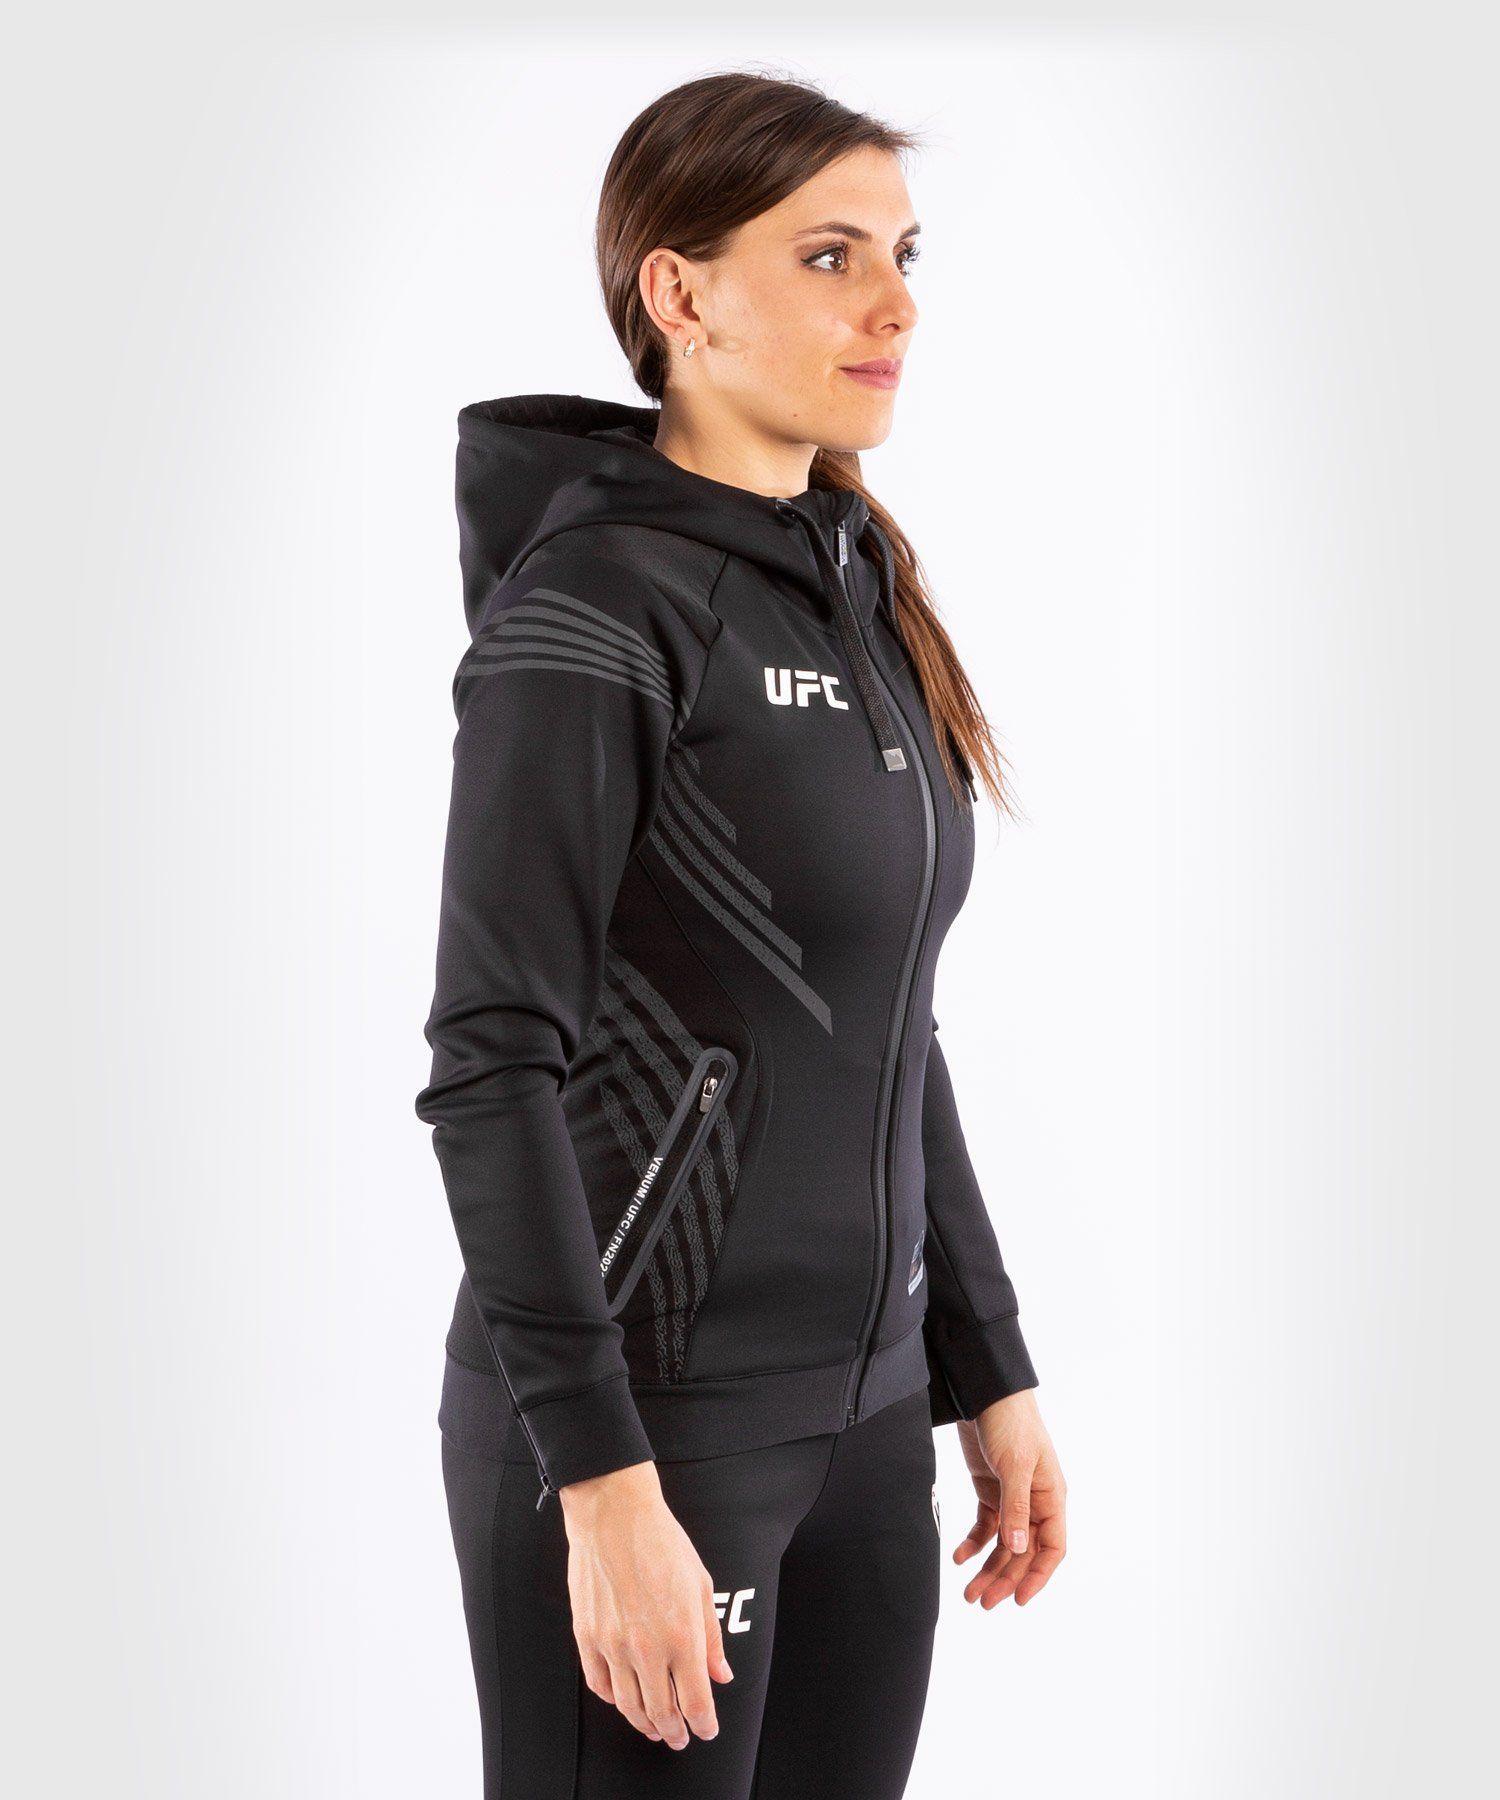 UFC Venum Fighters Authentic Fight Night Women's Walkout Hoodie - Black